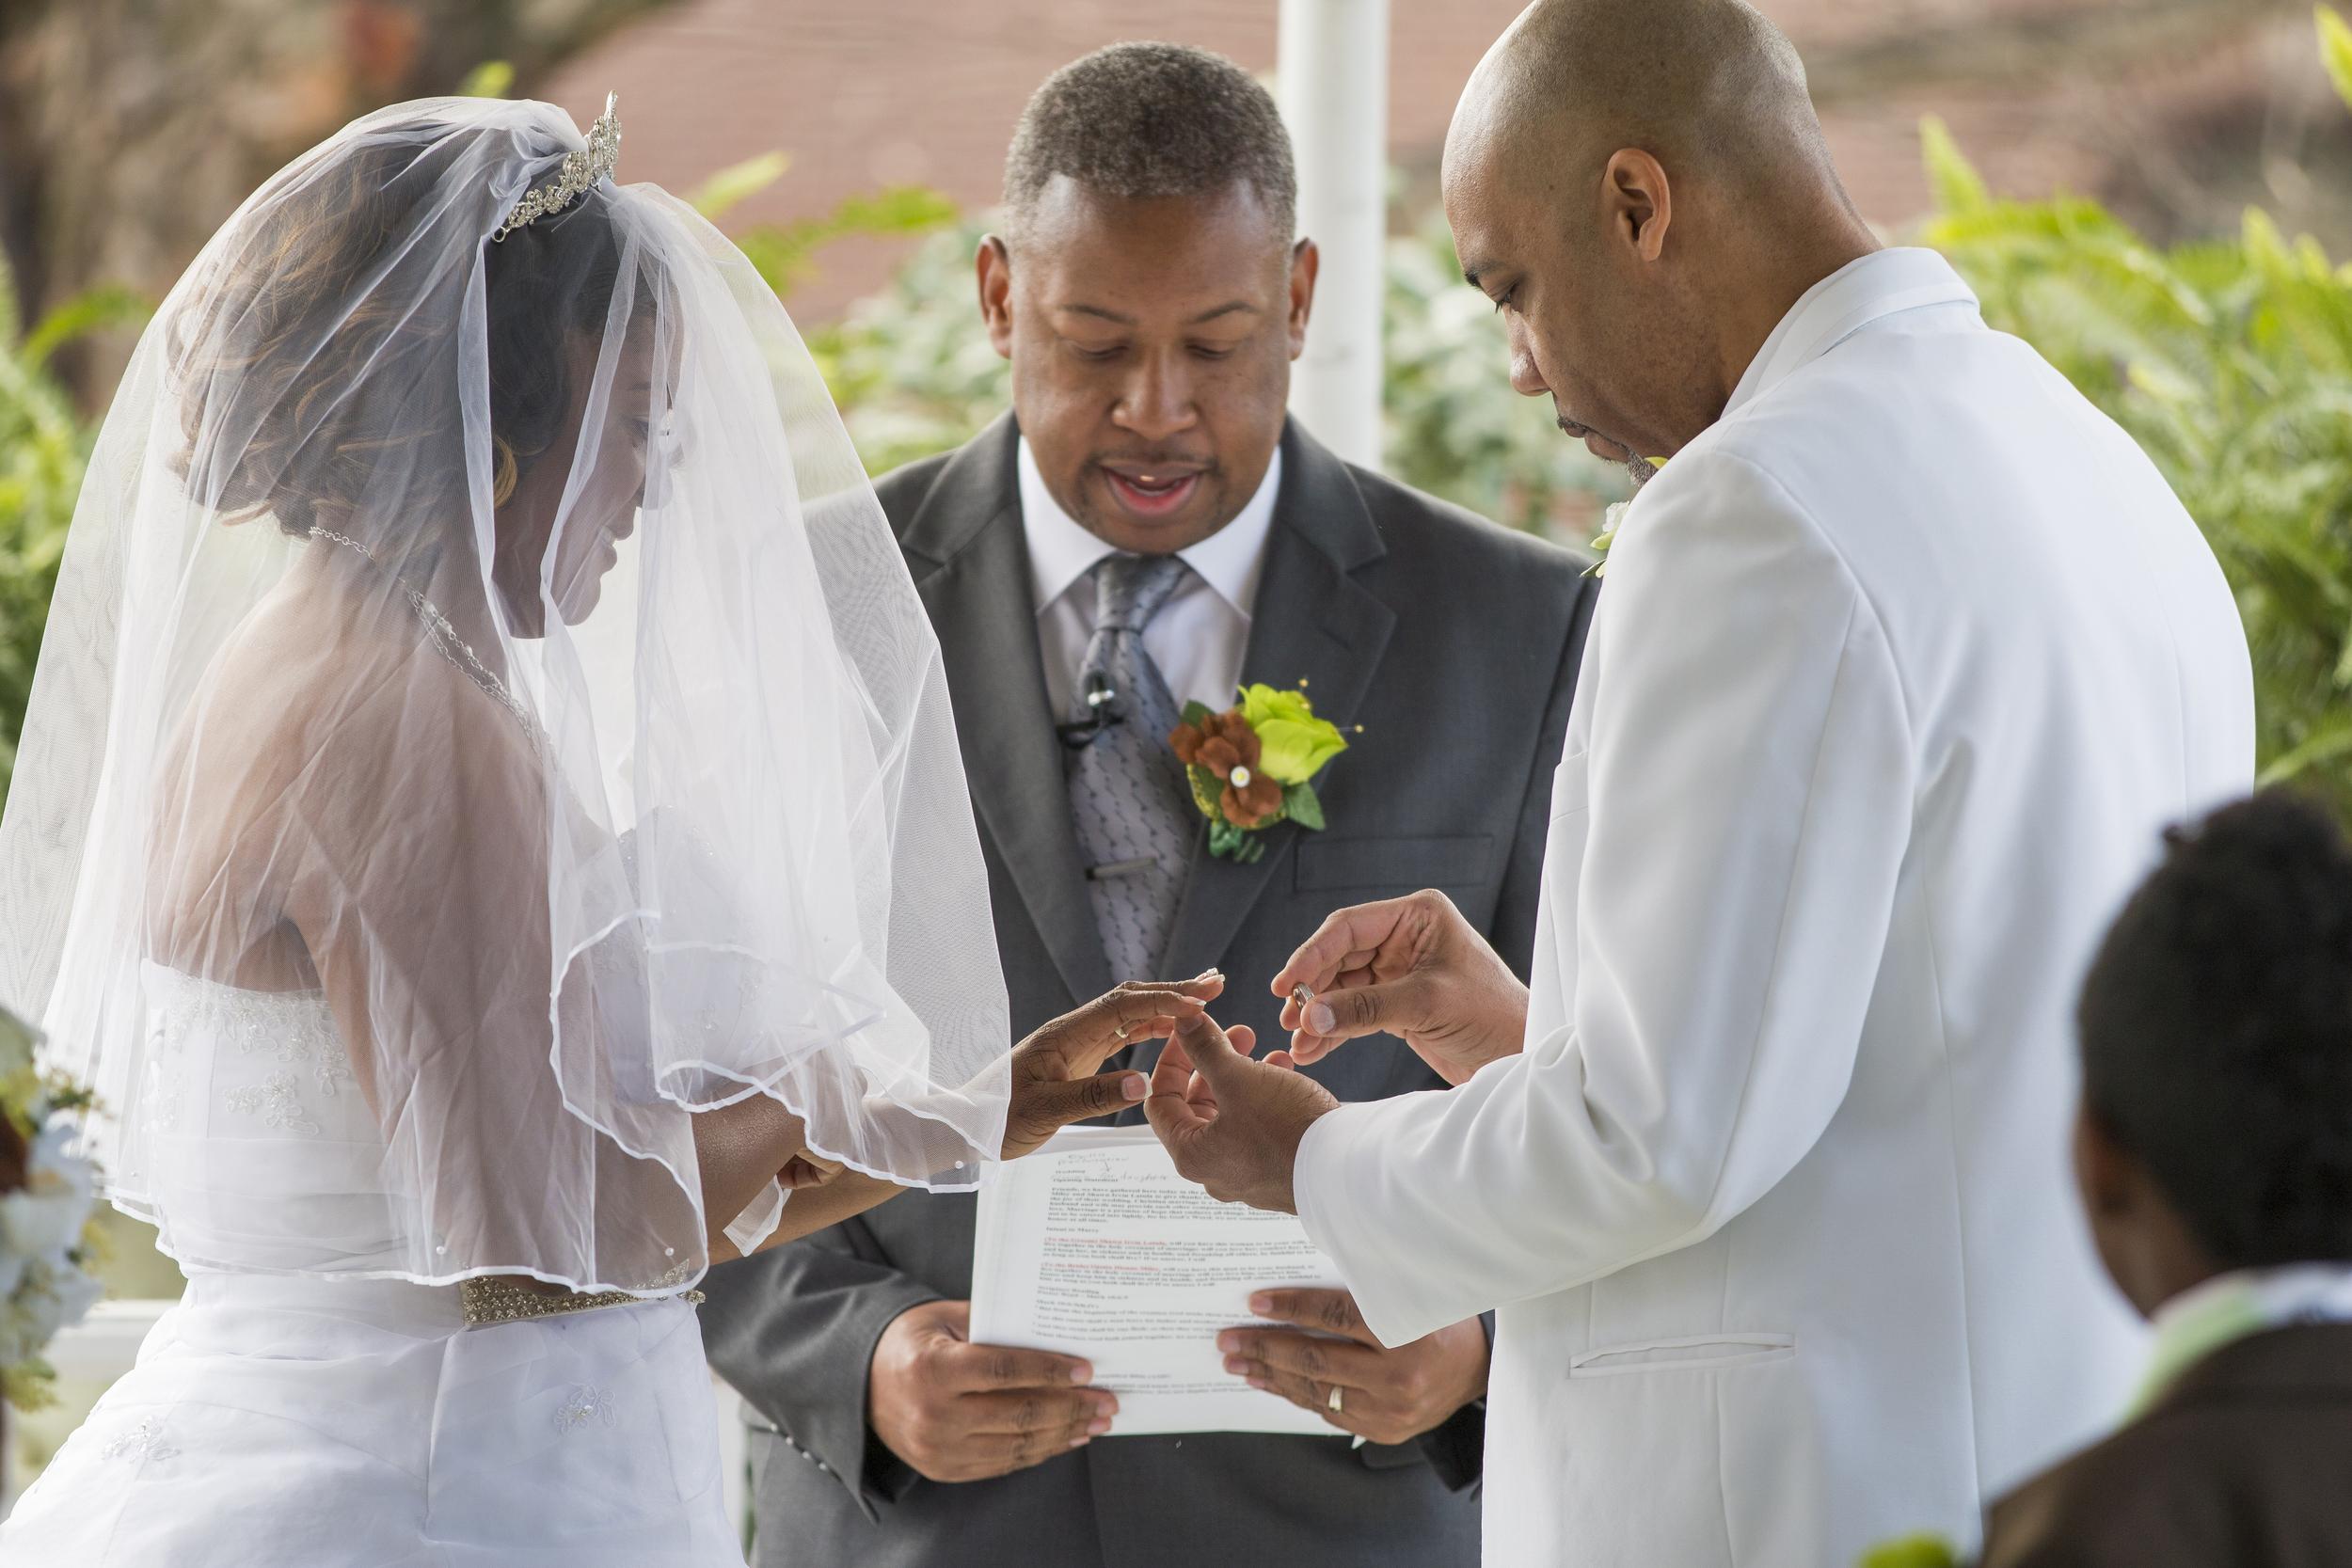 Wedding Ceremony Photographer in Garner, NC